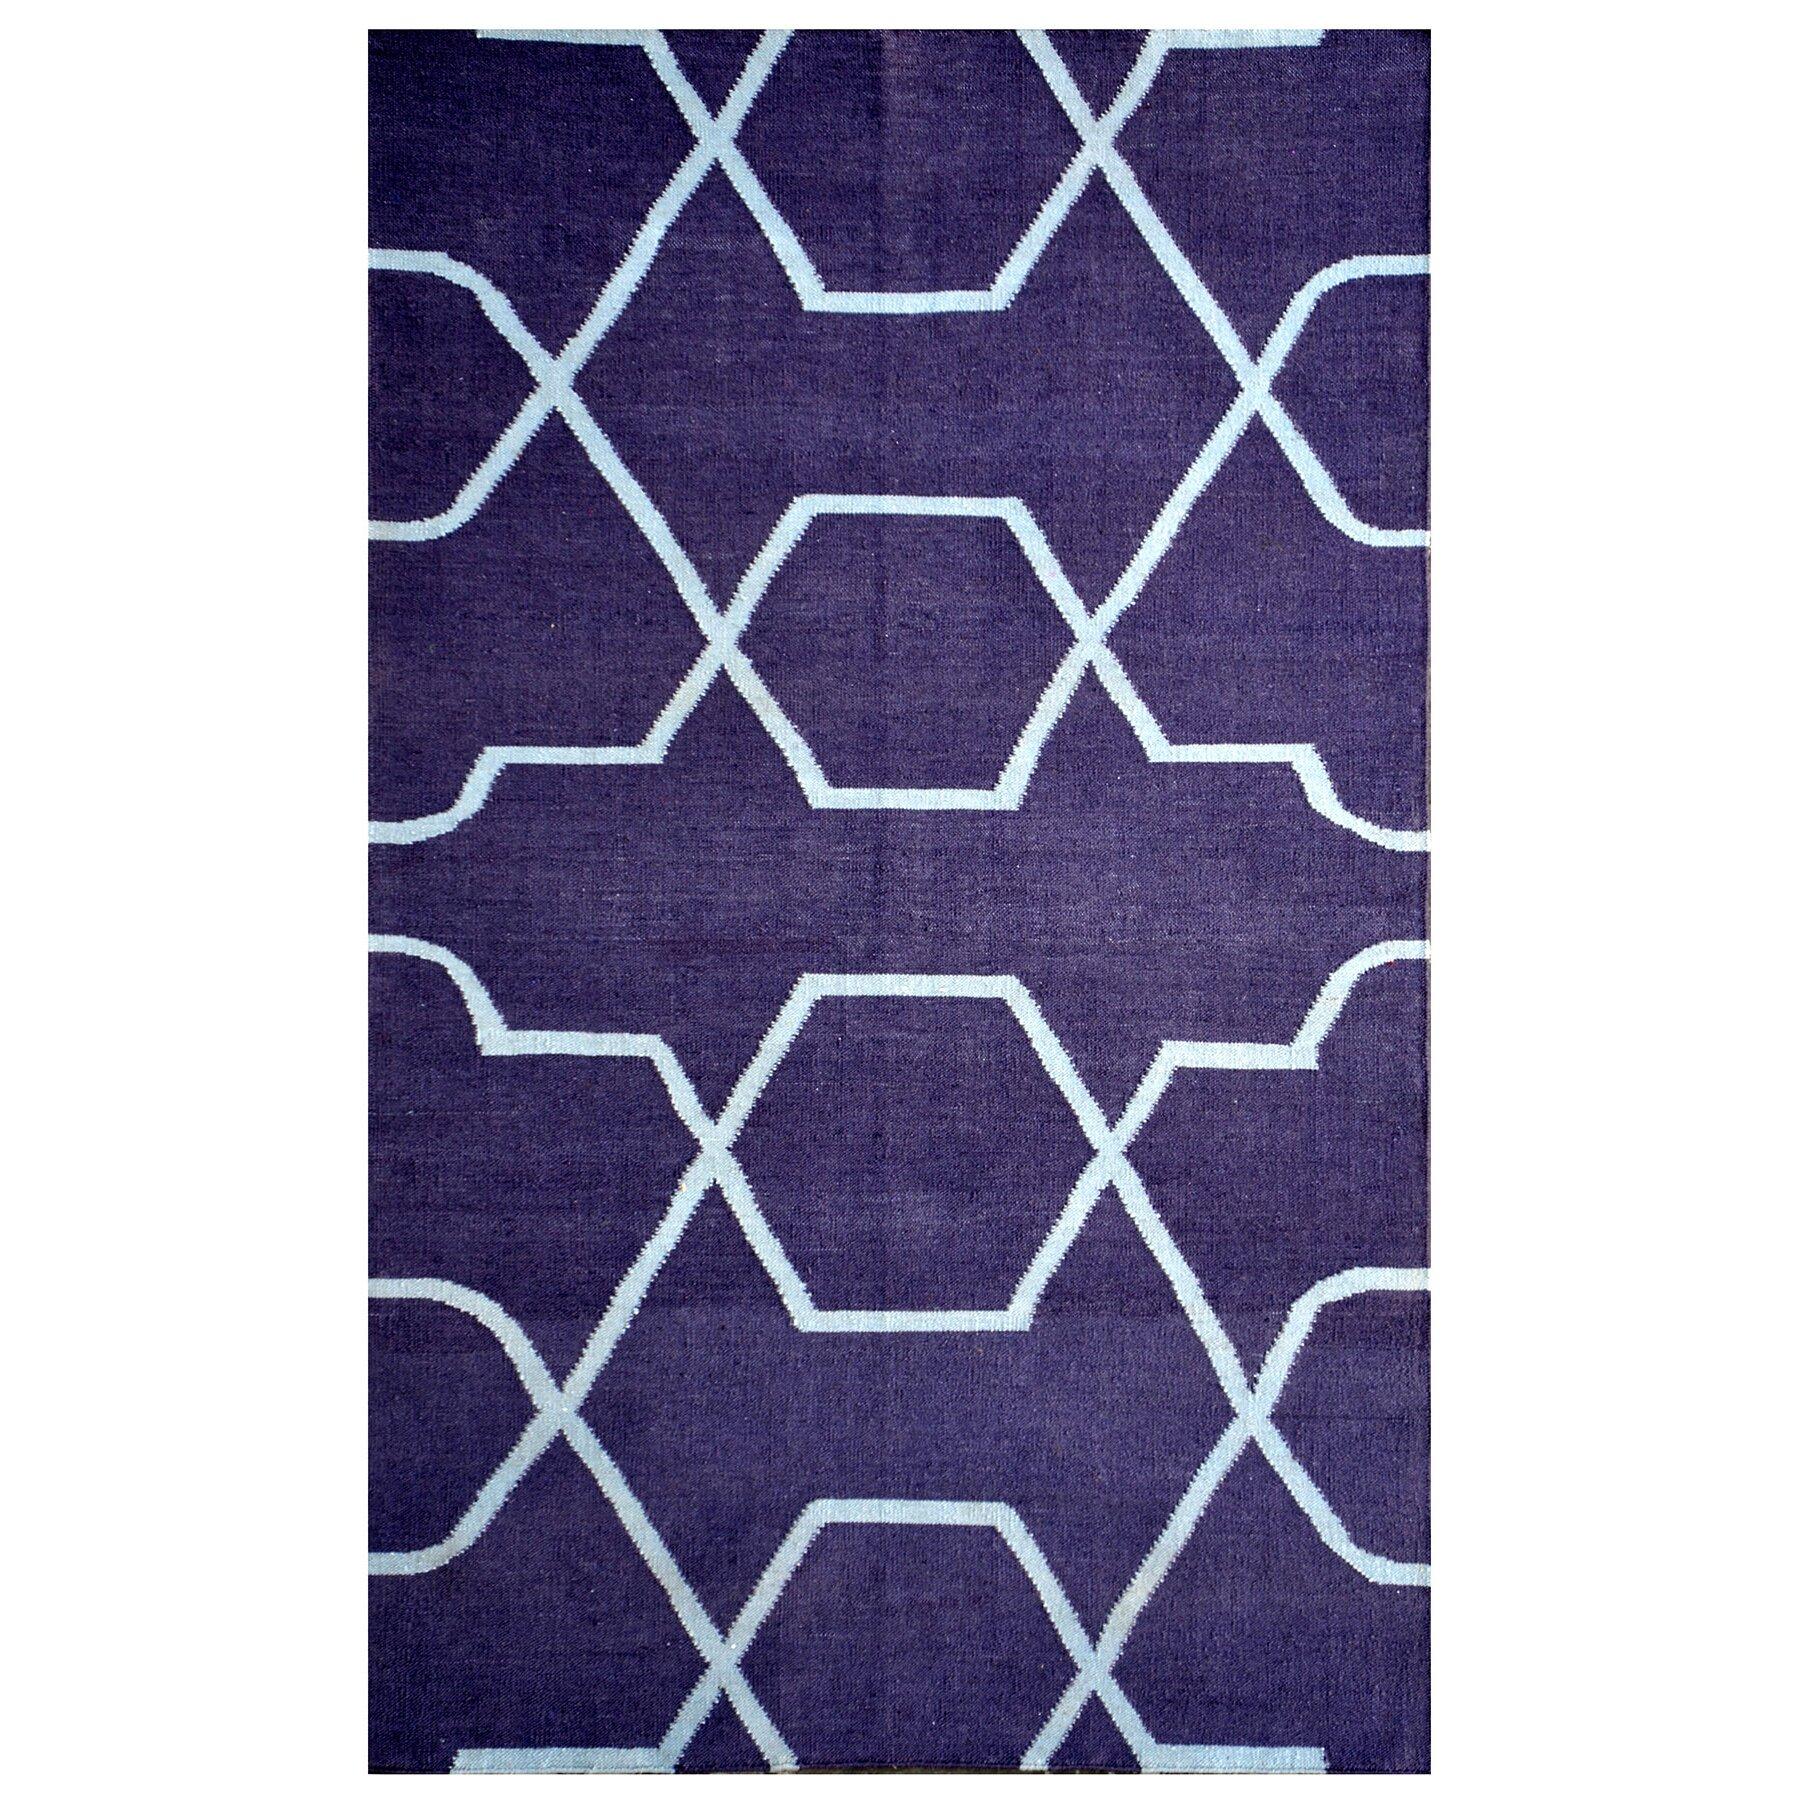 Meva rugs thai 01 blue indoor outdoor area rug wayfair for Blue indoor outdoor rug